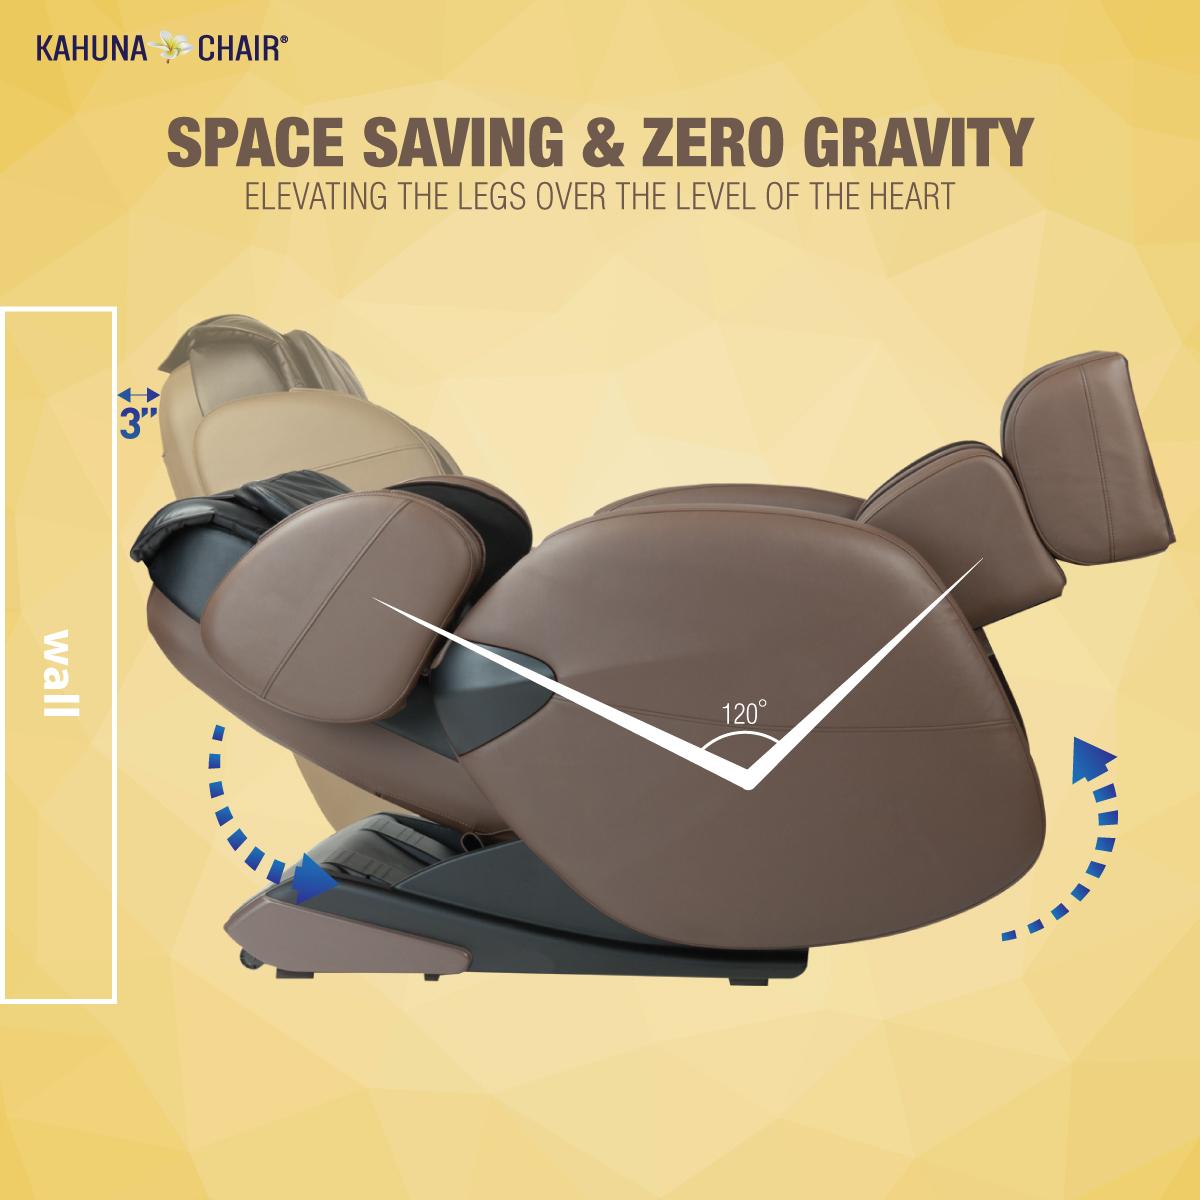 Kahuna LM 6800 Zero Gravity Recline